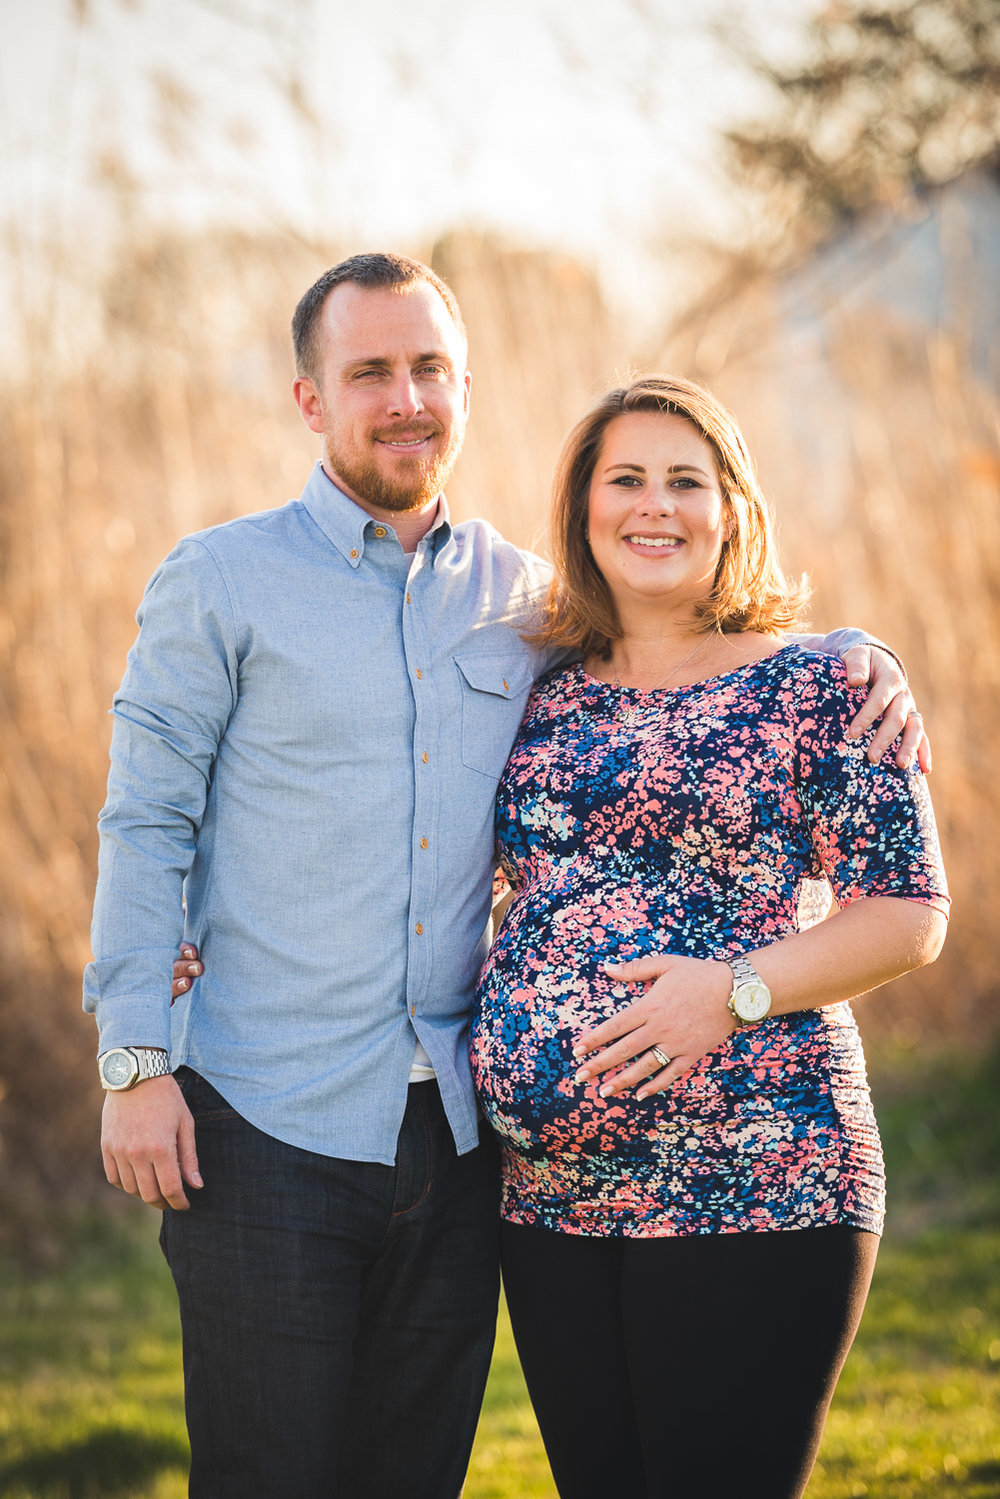 20170402 - Tiffany Samick Maternity LR-16.jpg